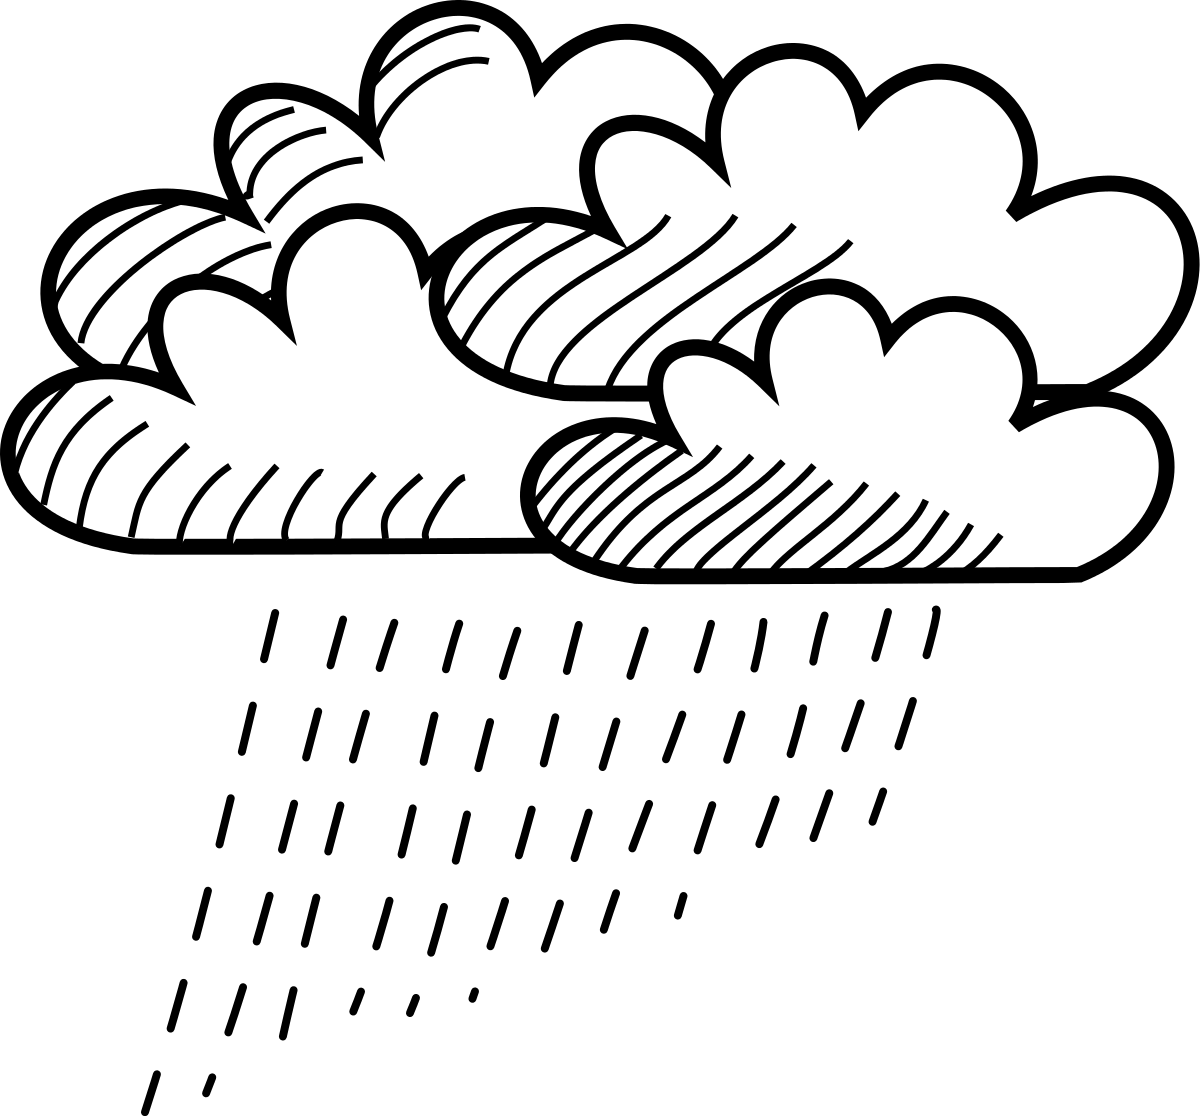 Rain Line Drawing